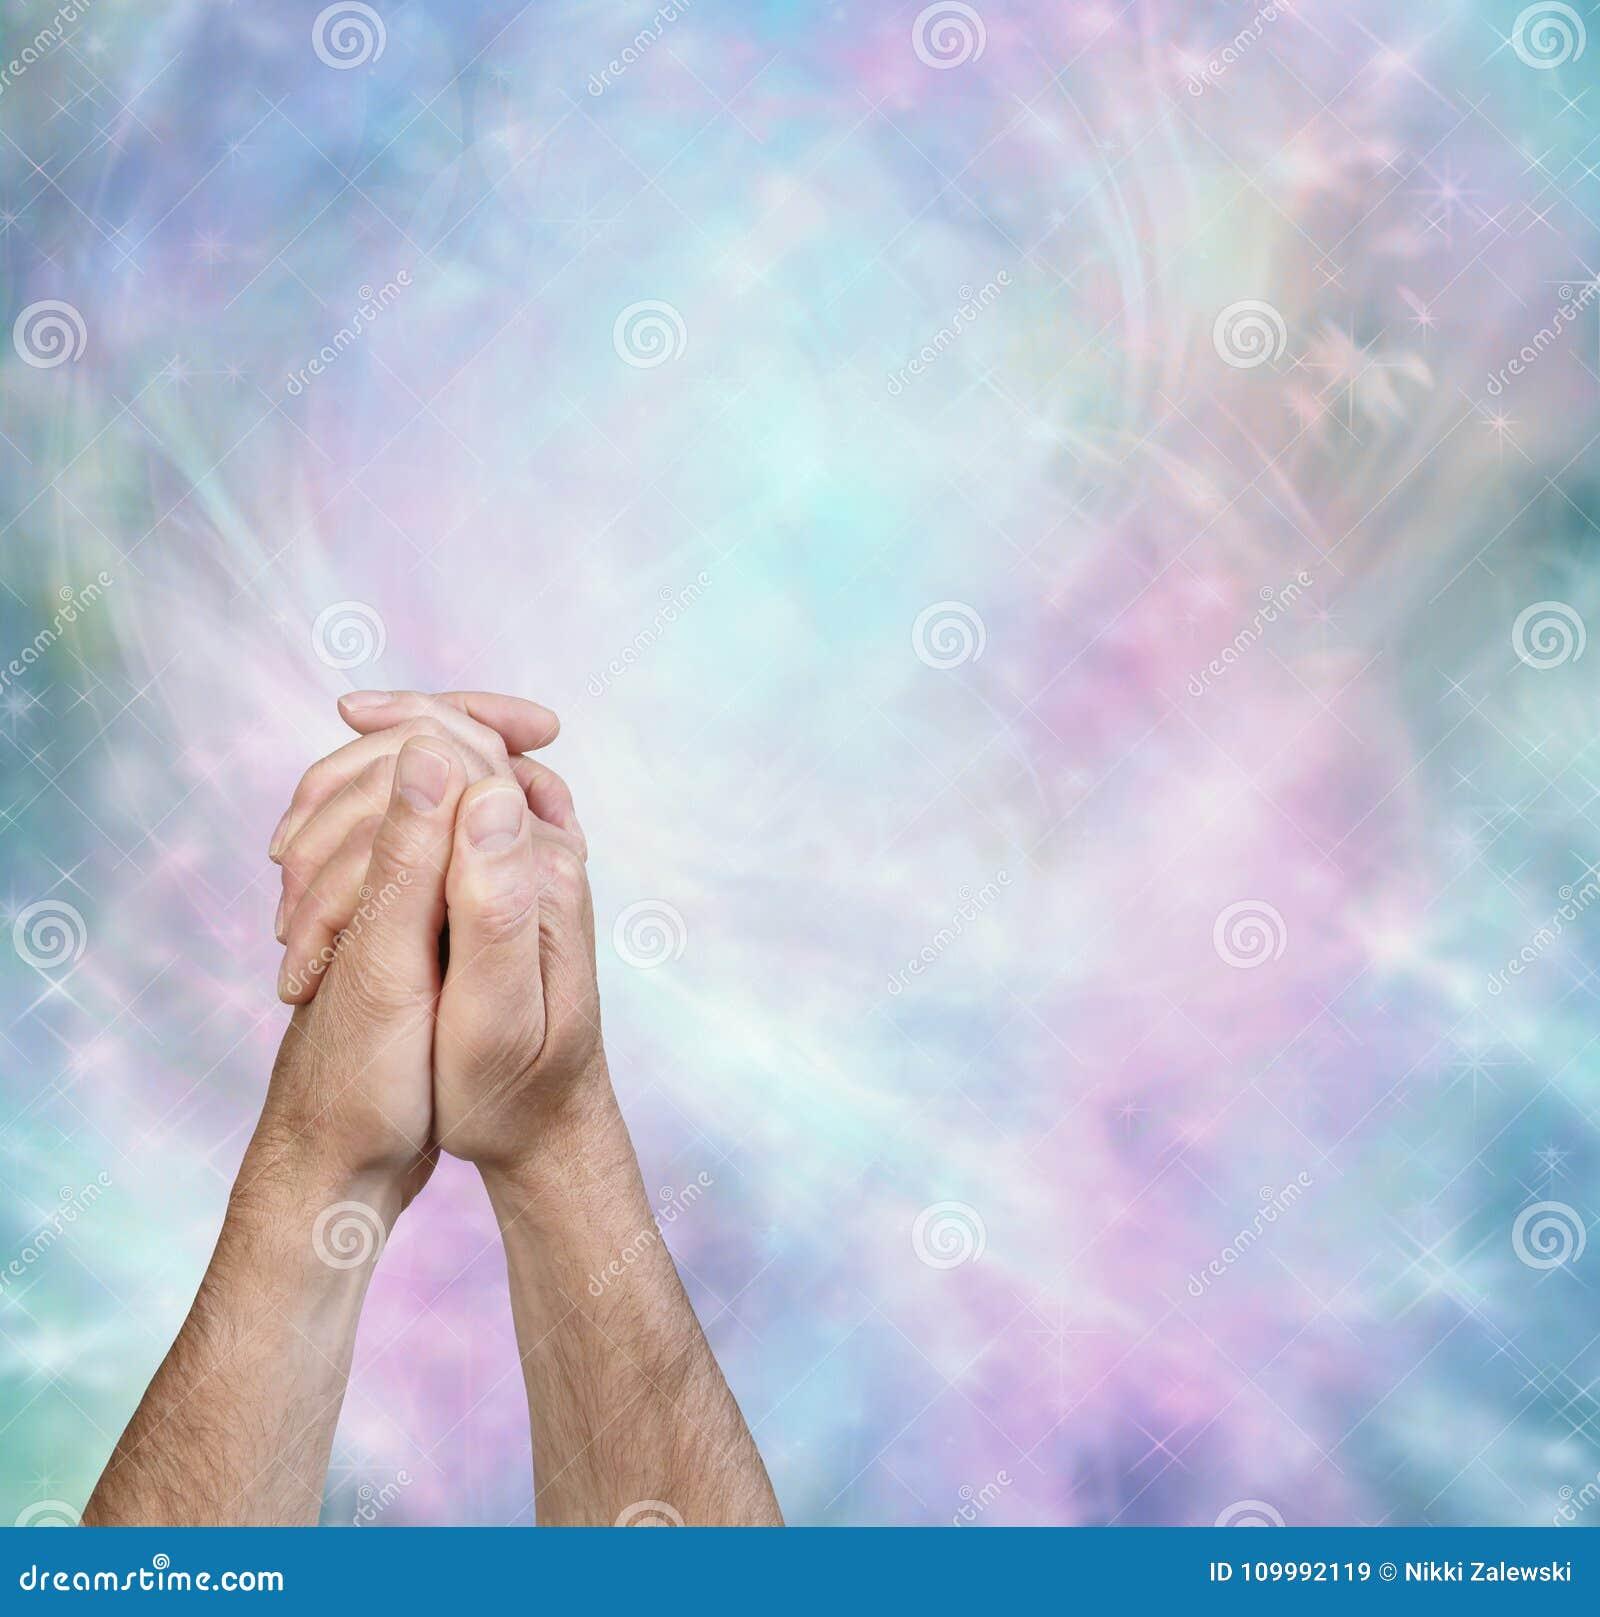 praying hands message border background stock image